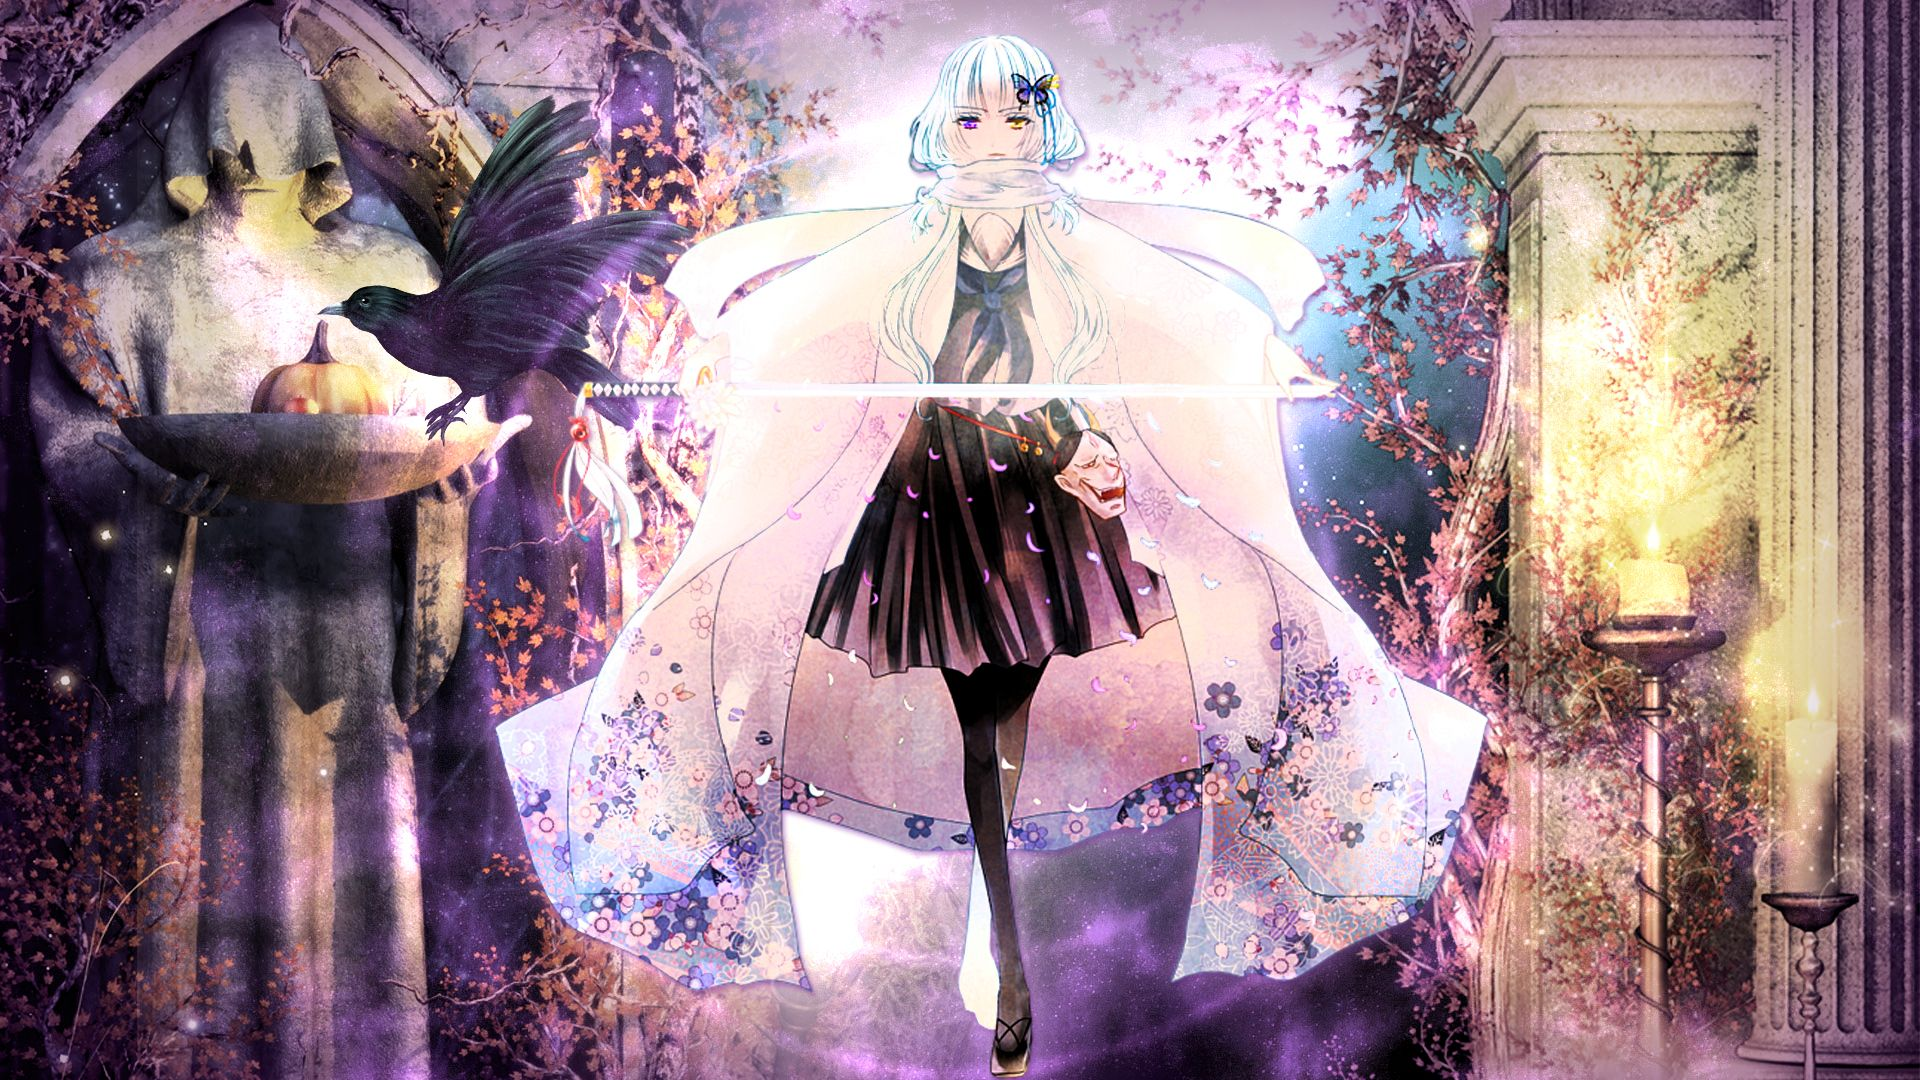 Anime Wallpaper Anime Wallpaper Anime Backgrounds Wallpapers Hd Anime Wallpapers 21 anime wallpaper hd for desktop